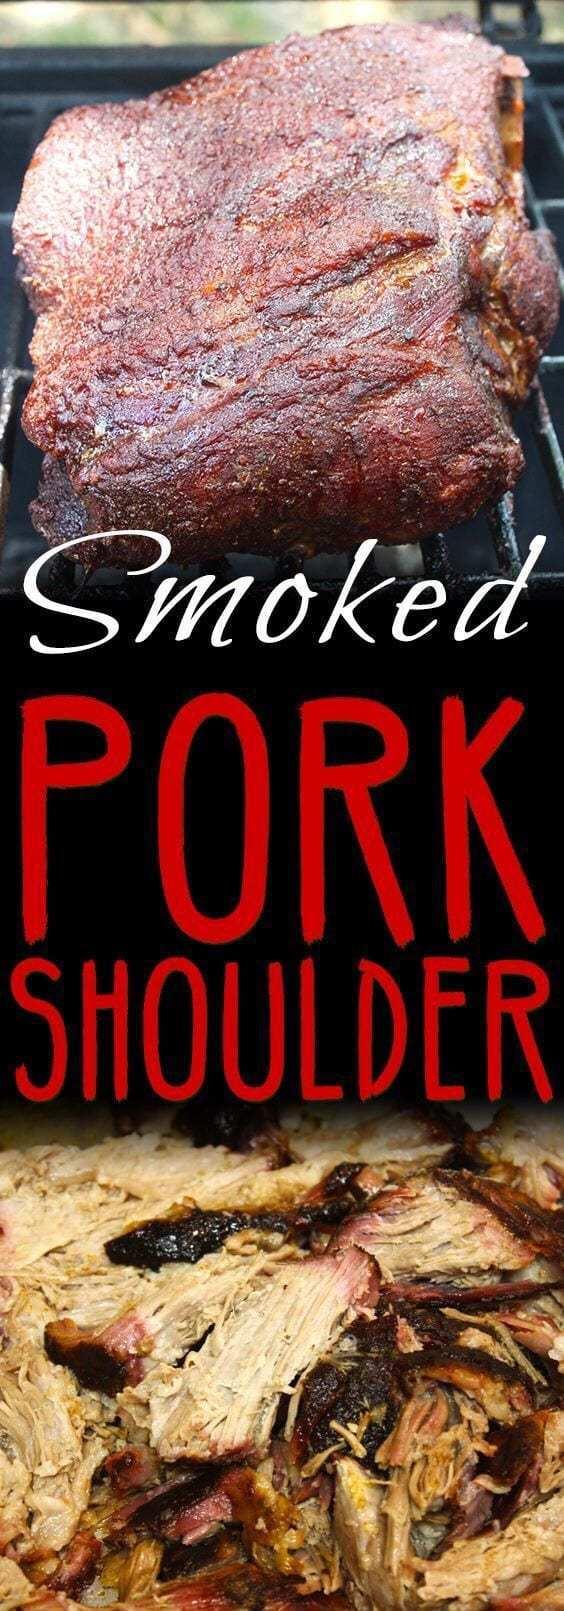 Smoked-Pork-Shoulder